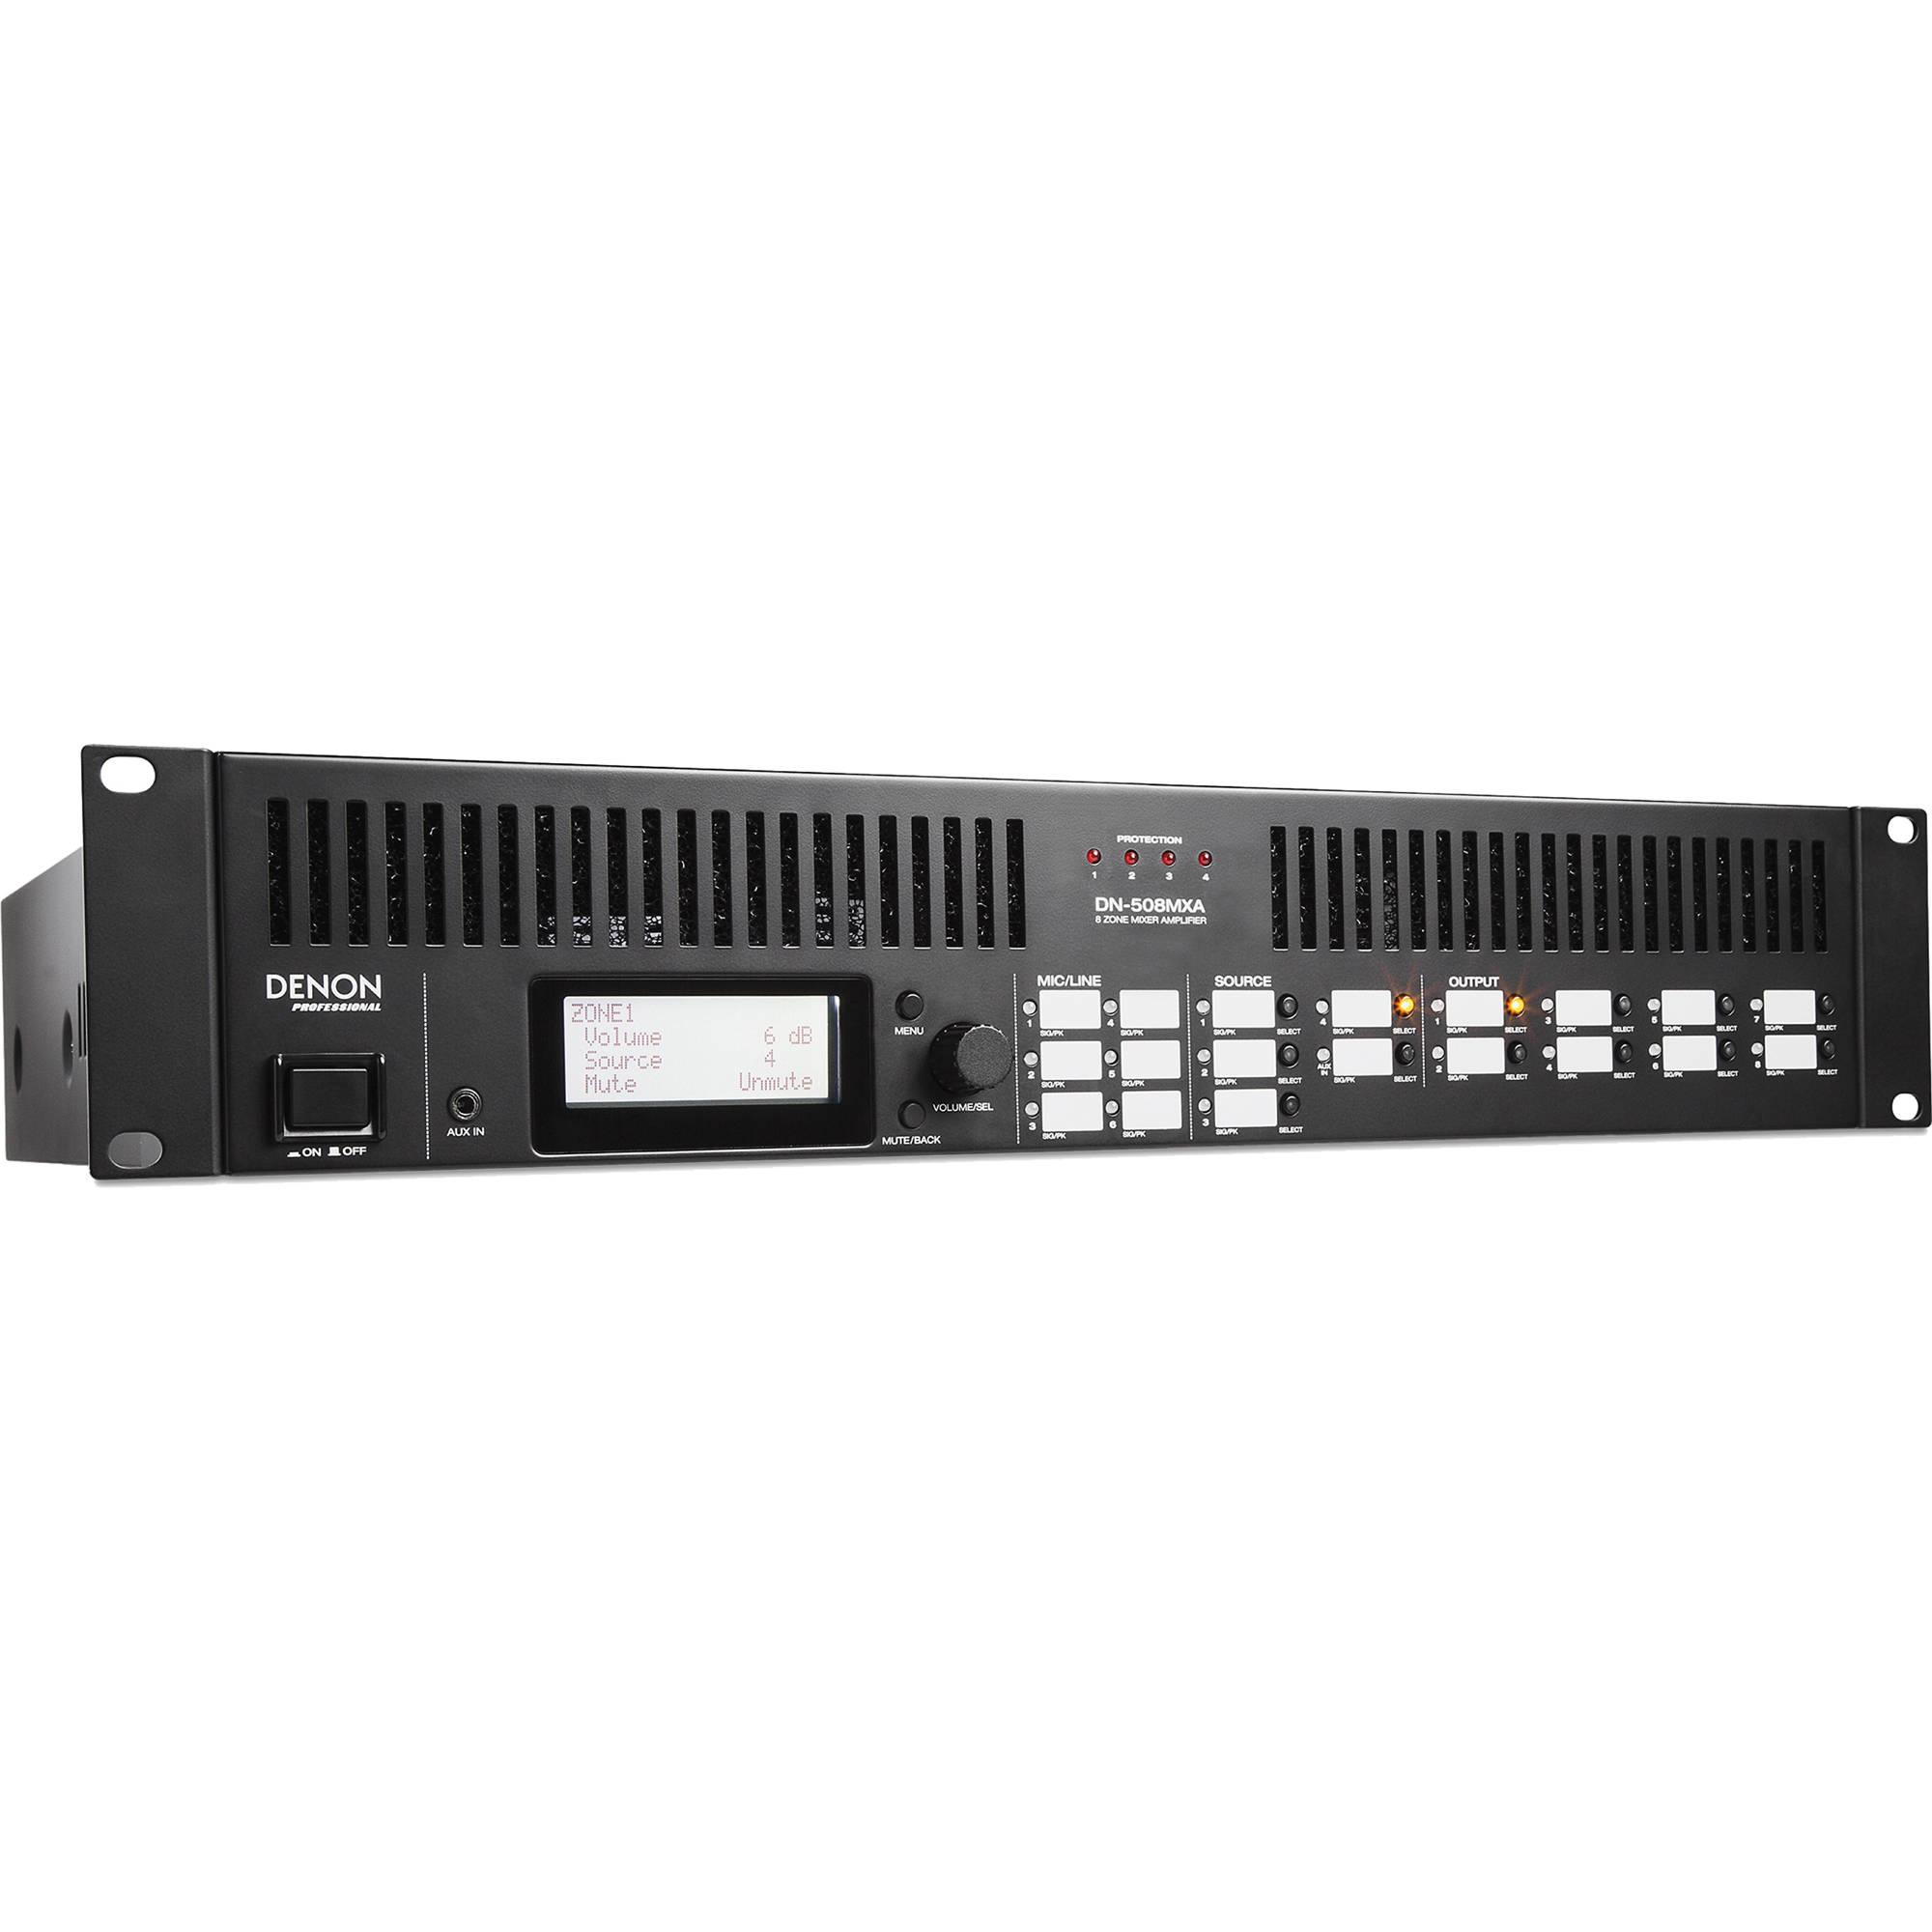 Denon DN-508MXA Powered 8-Zone Digital Mixer